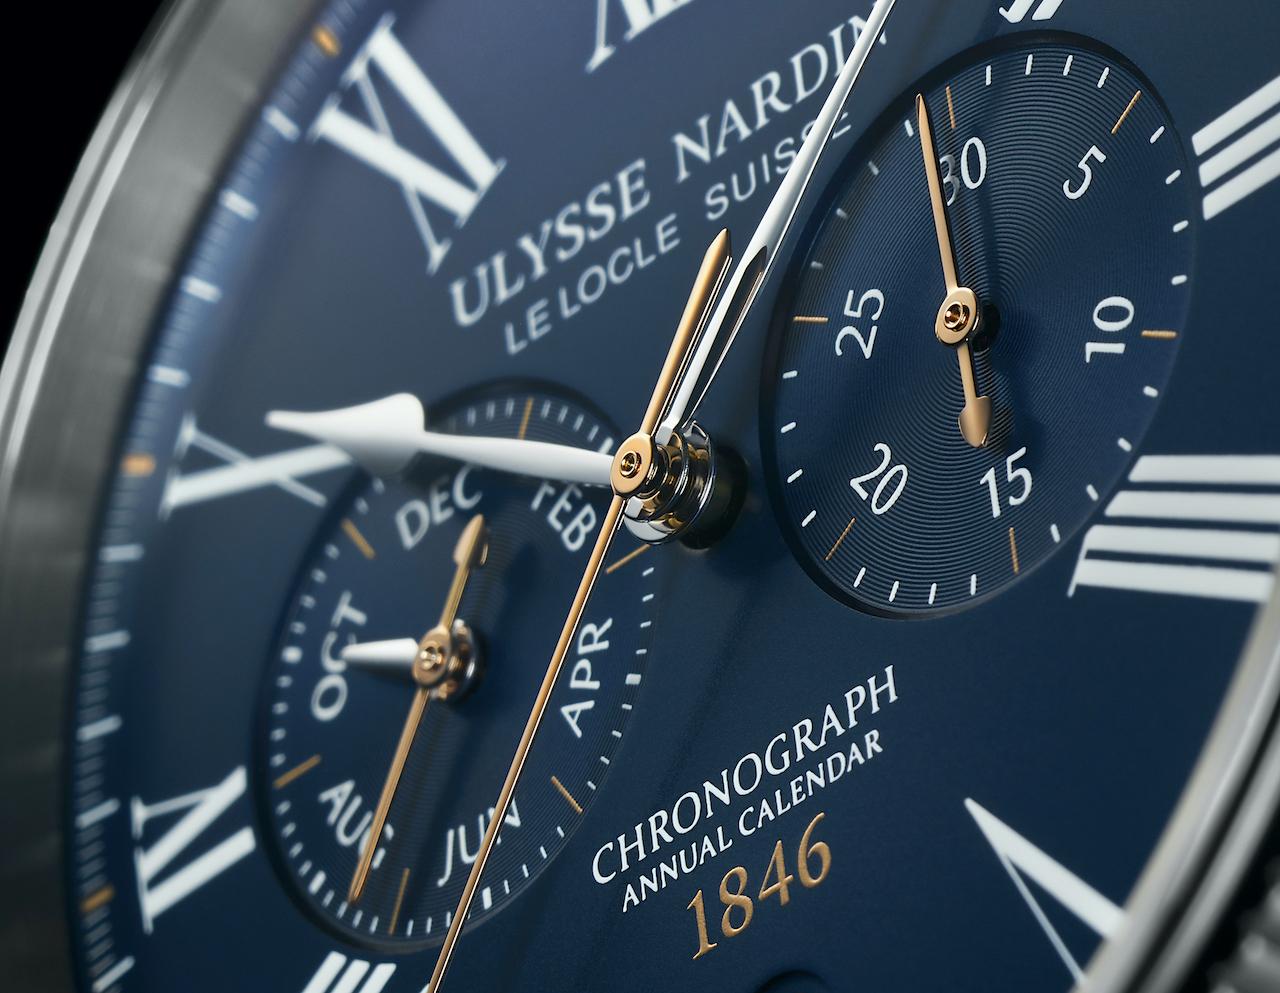 Ulysse Nardin en los Geneva Watch Days 2021 - Marine Torpilleur Chronopgraph Annual - esfera